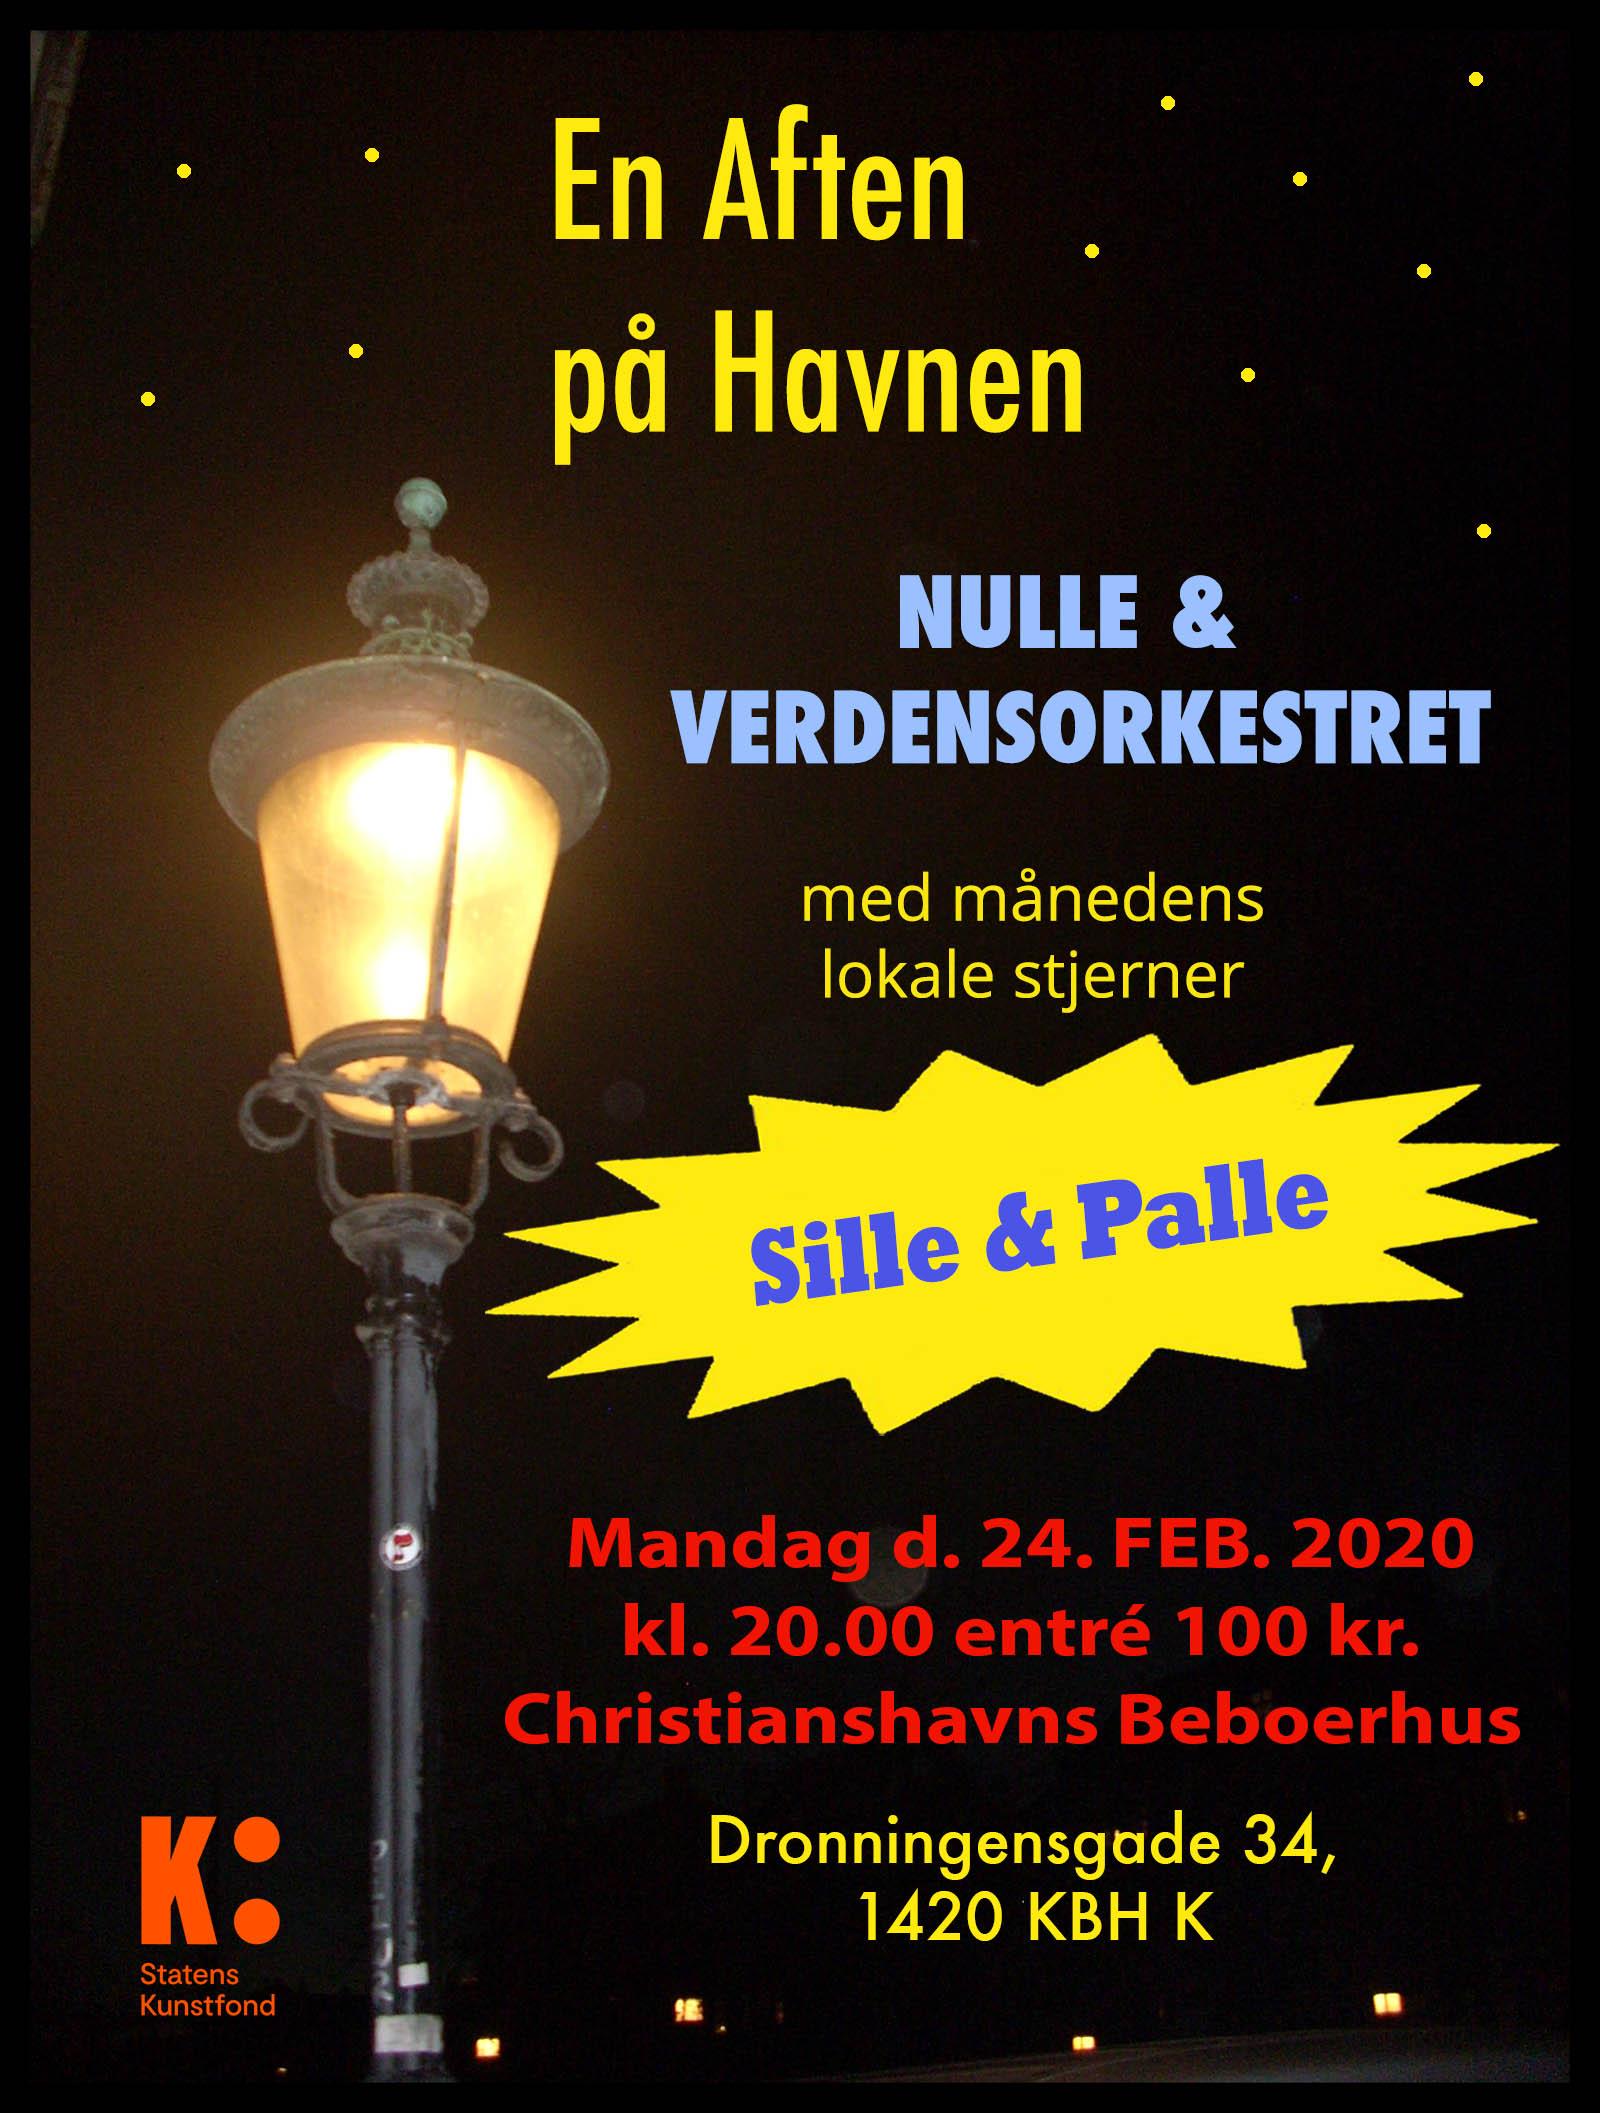 Nulle & Verdensorkestret m. Sille & Palle